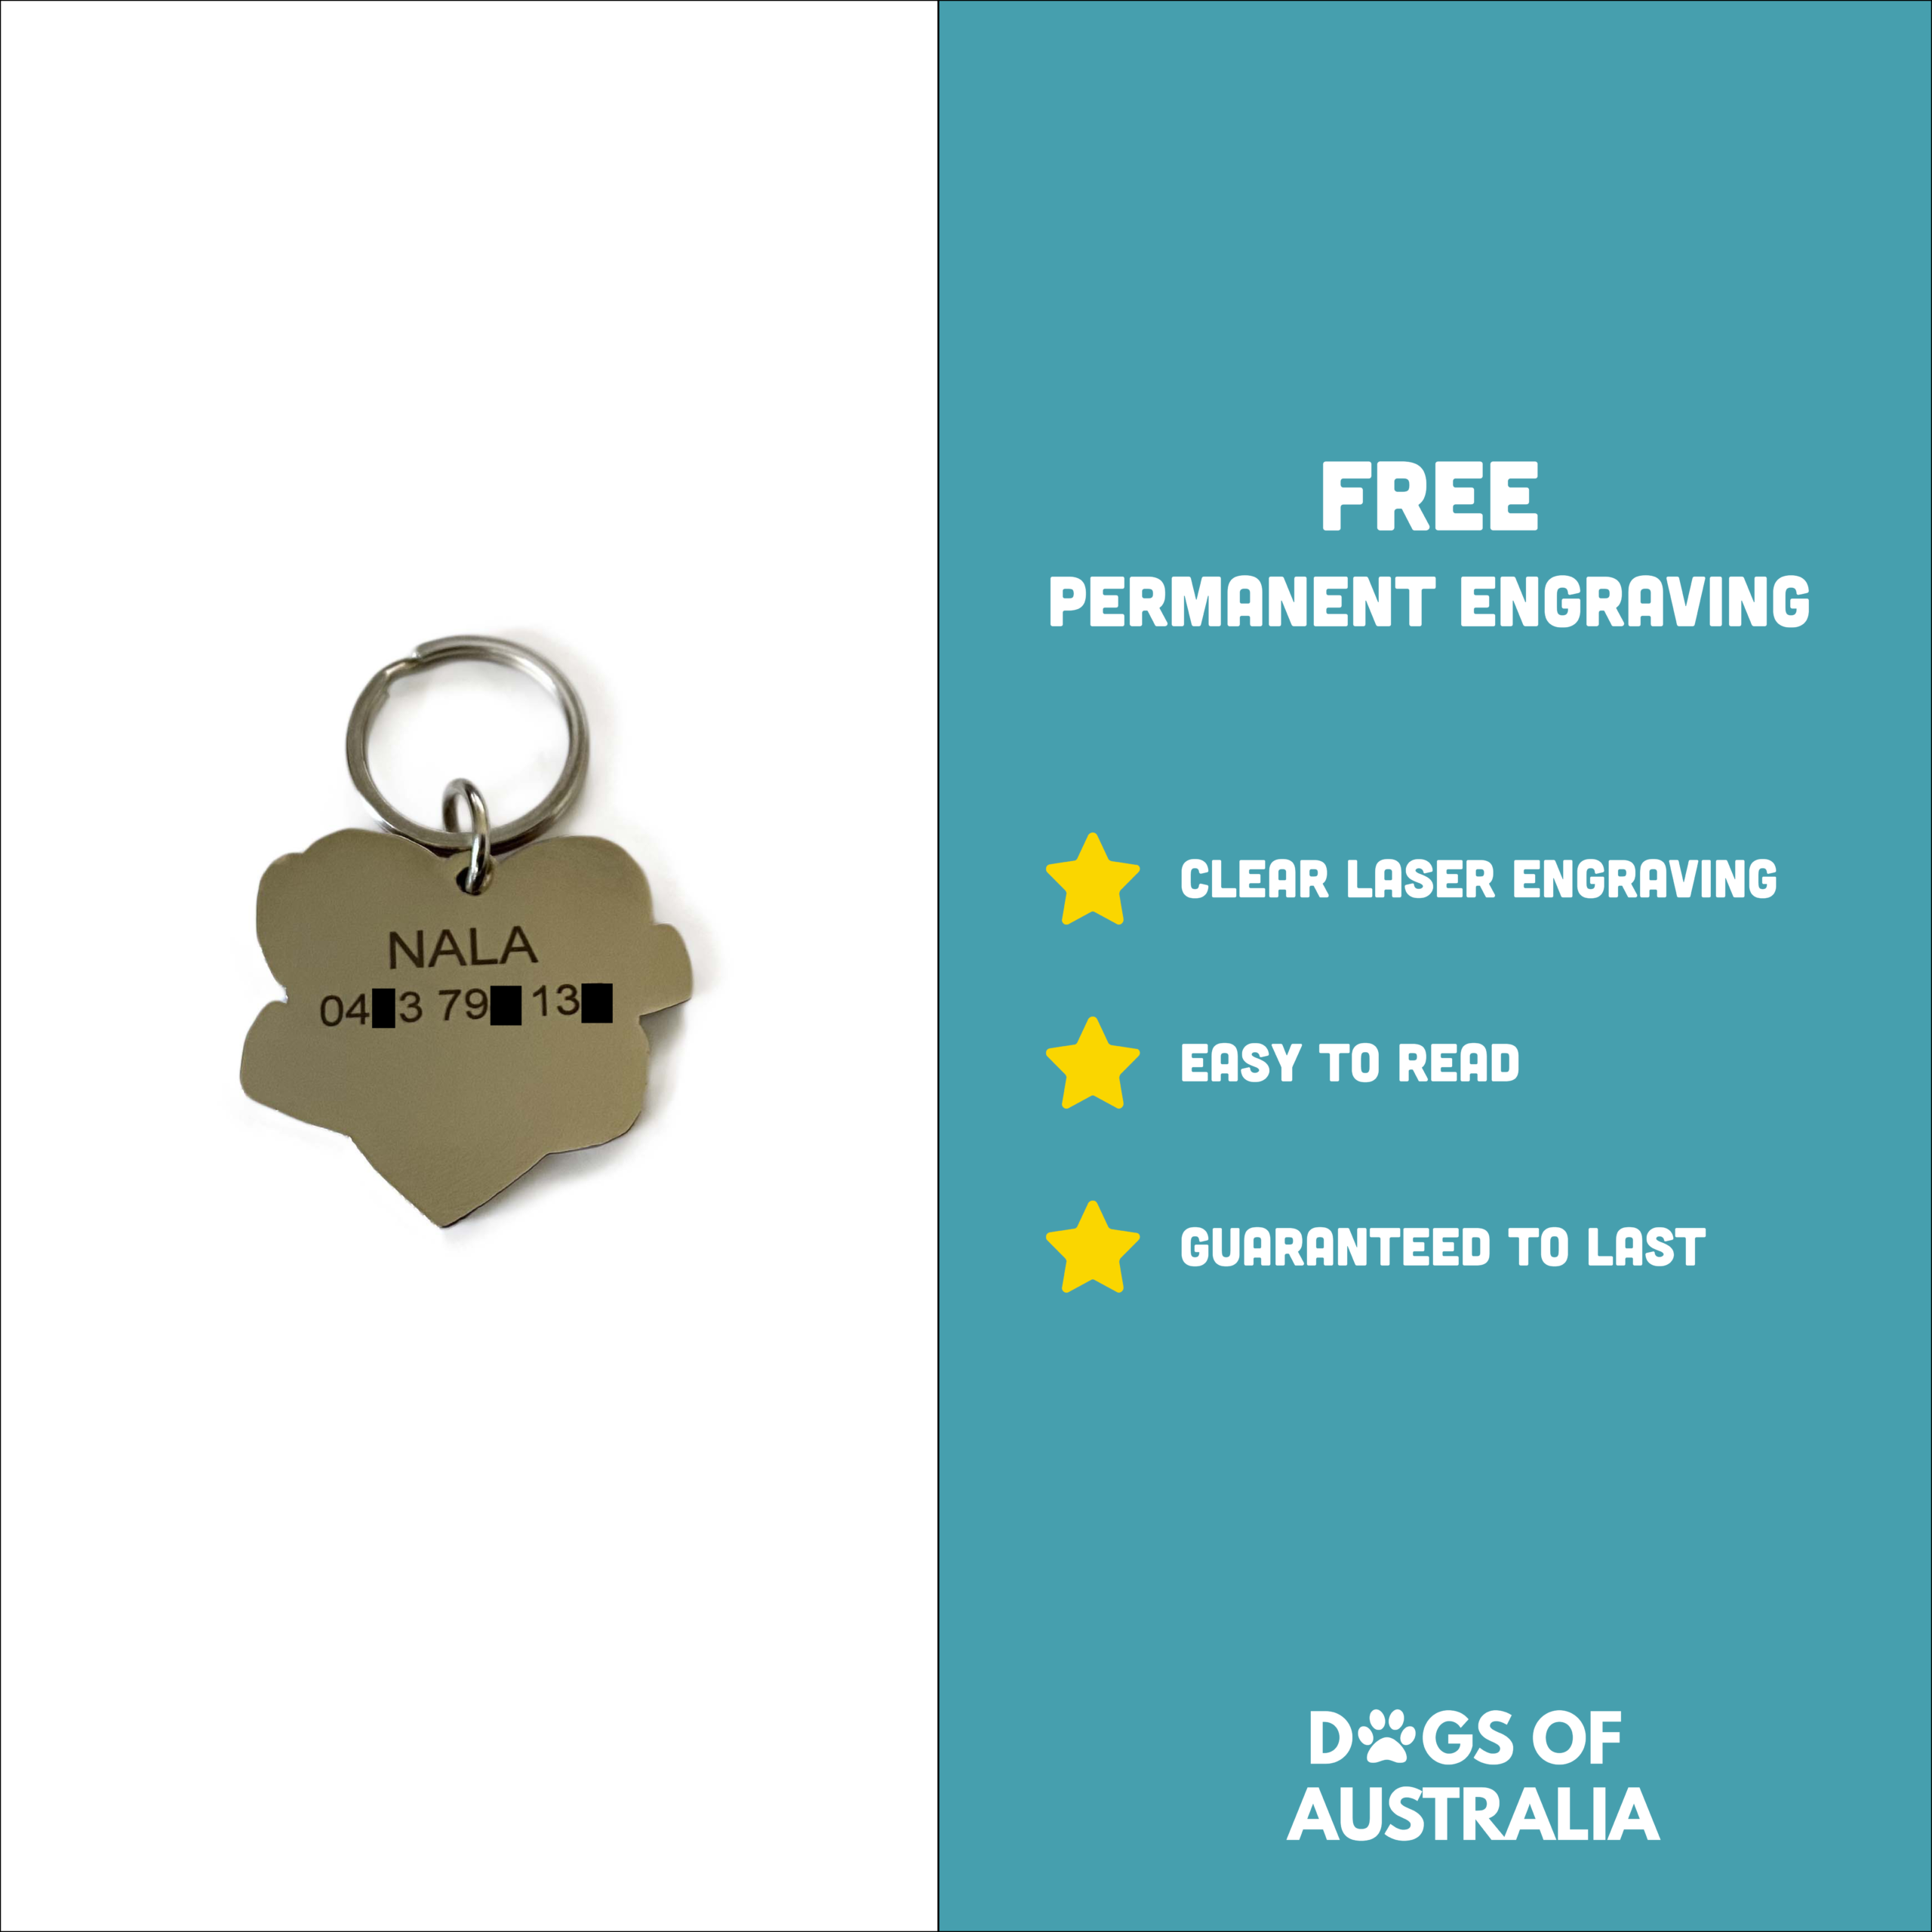 Explainer image about free laser engraving benefits